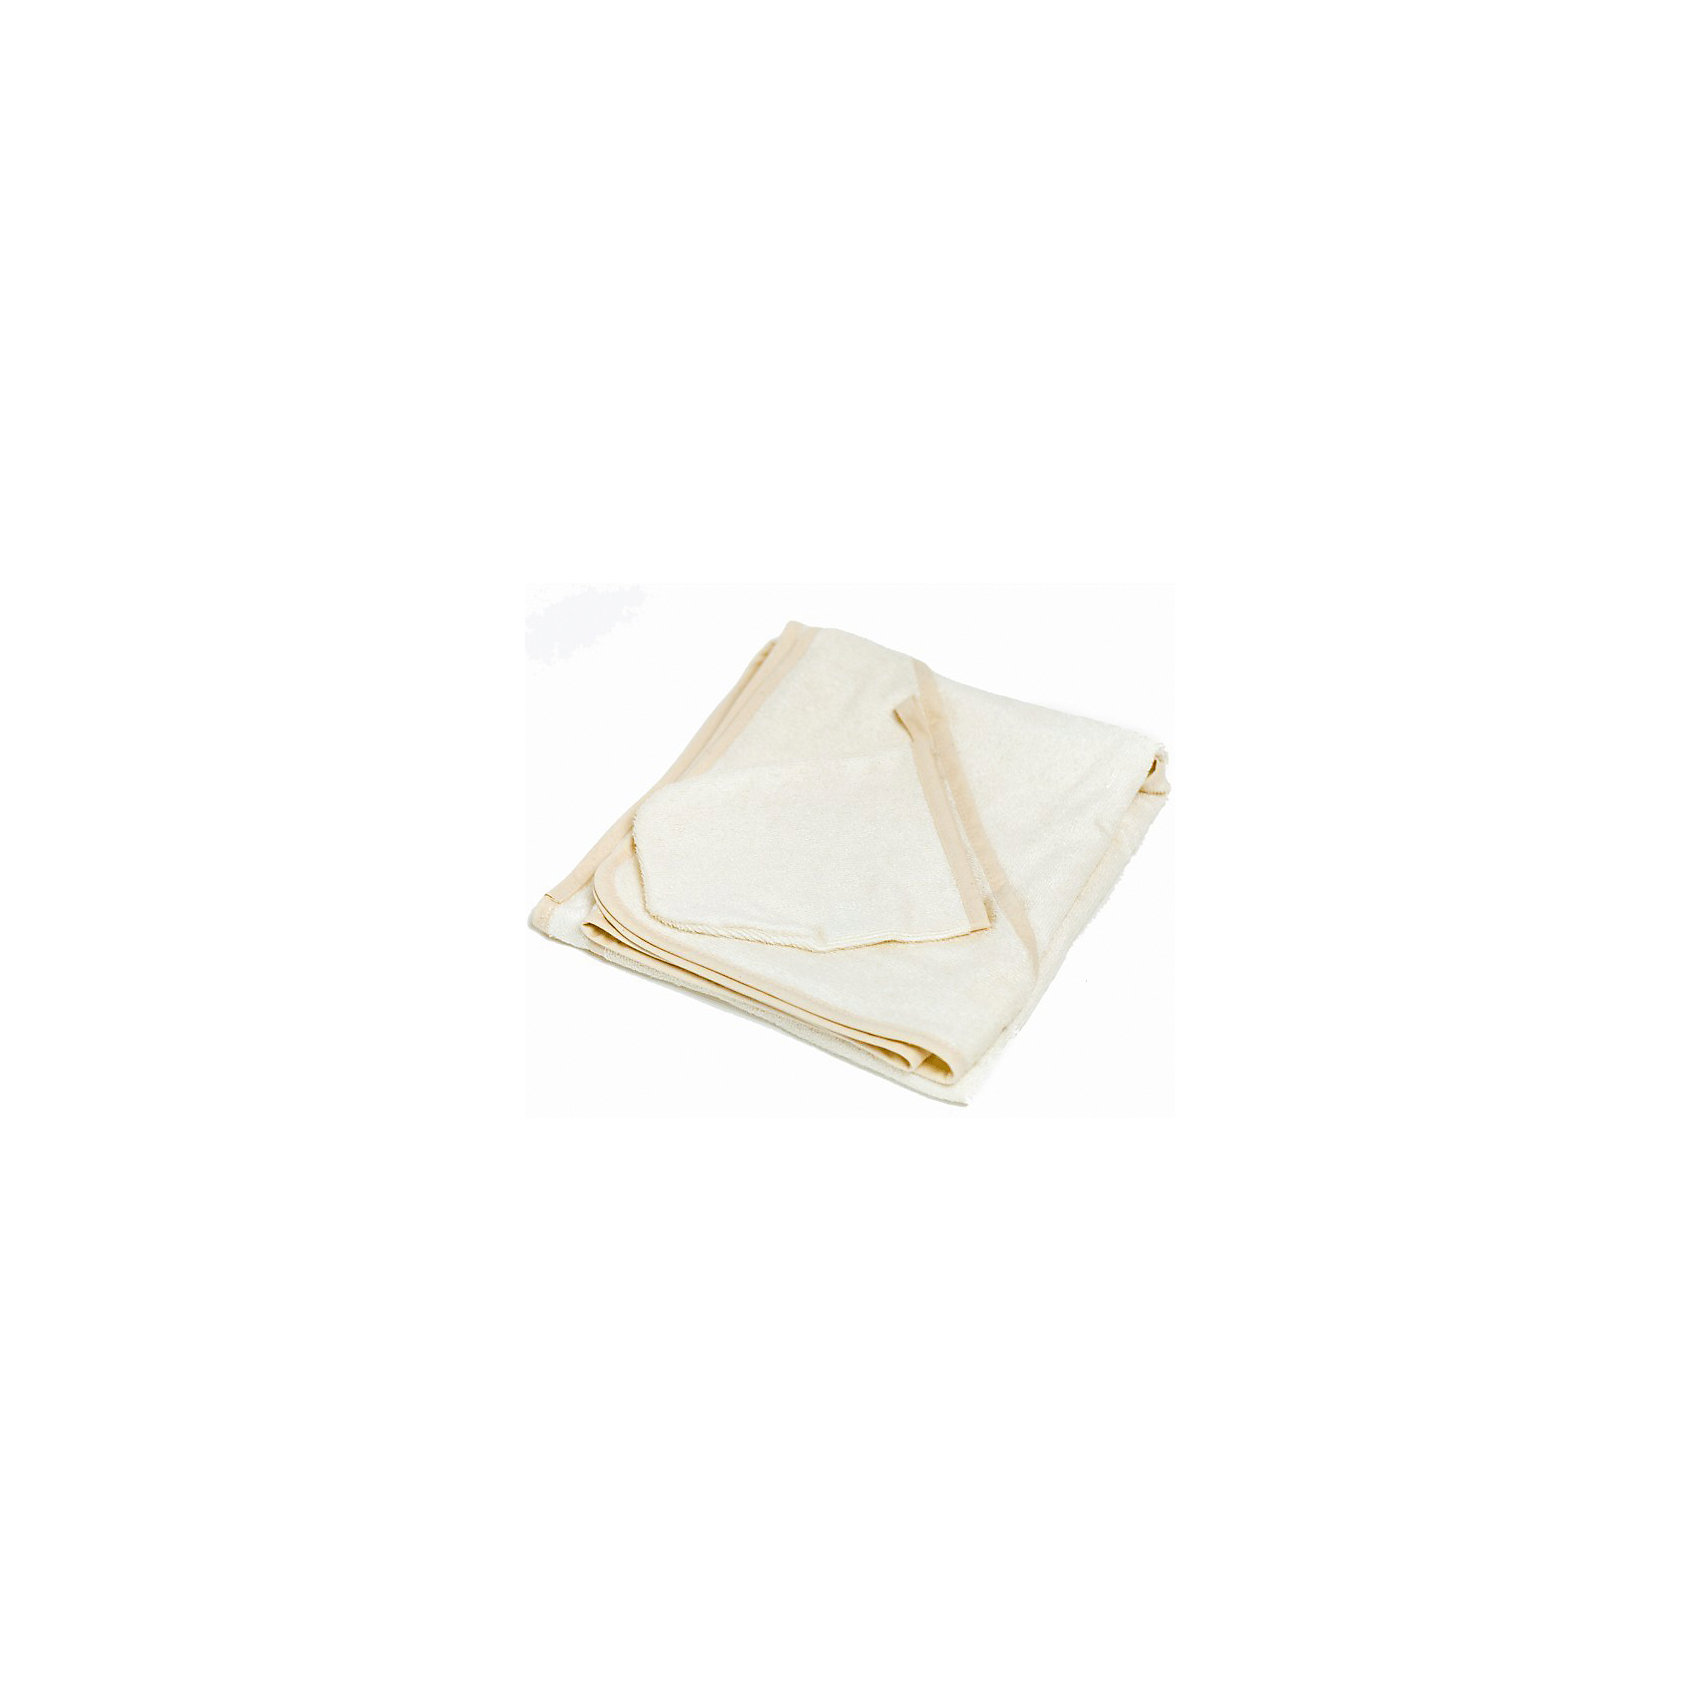 Italbaby Махровое полотенце 100/100, Italbaby, бежевый italbaby панно настенное с карманами для принадлежностей italbaby angioletti арт 710 0014